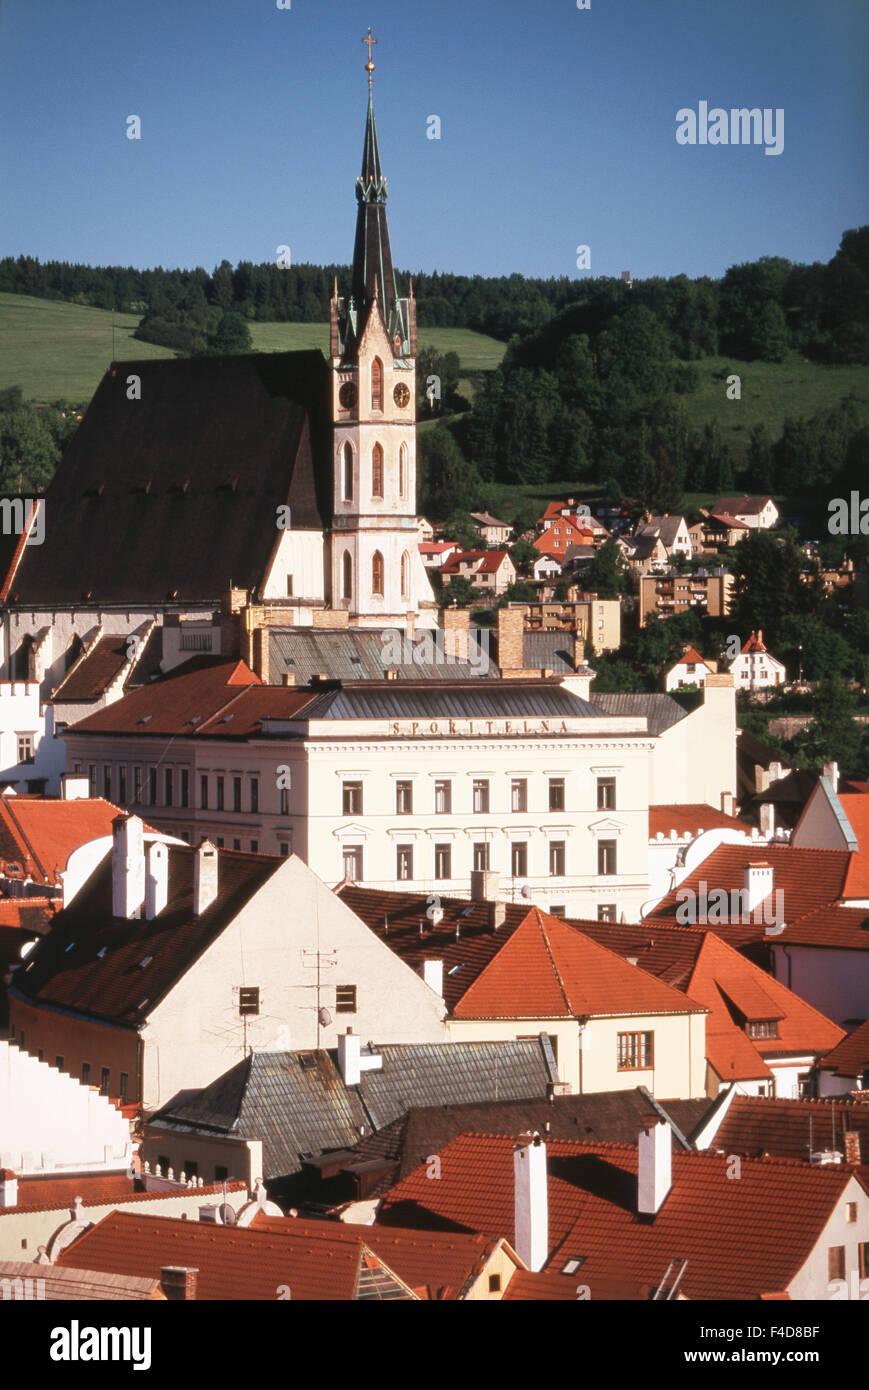 Czech Republic, South Bohemian Region, Cesky Krumlov. town and castle. (Large format sizes available) - Stock Image